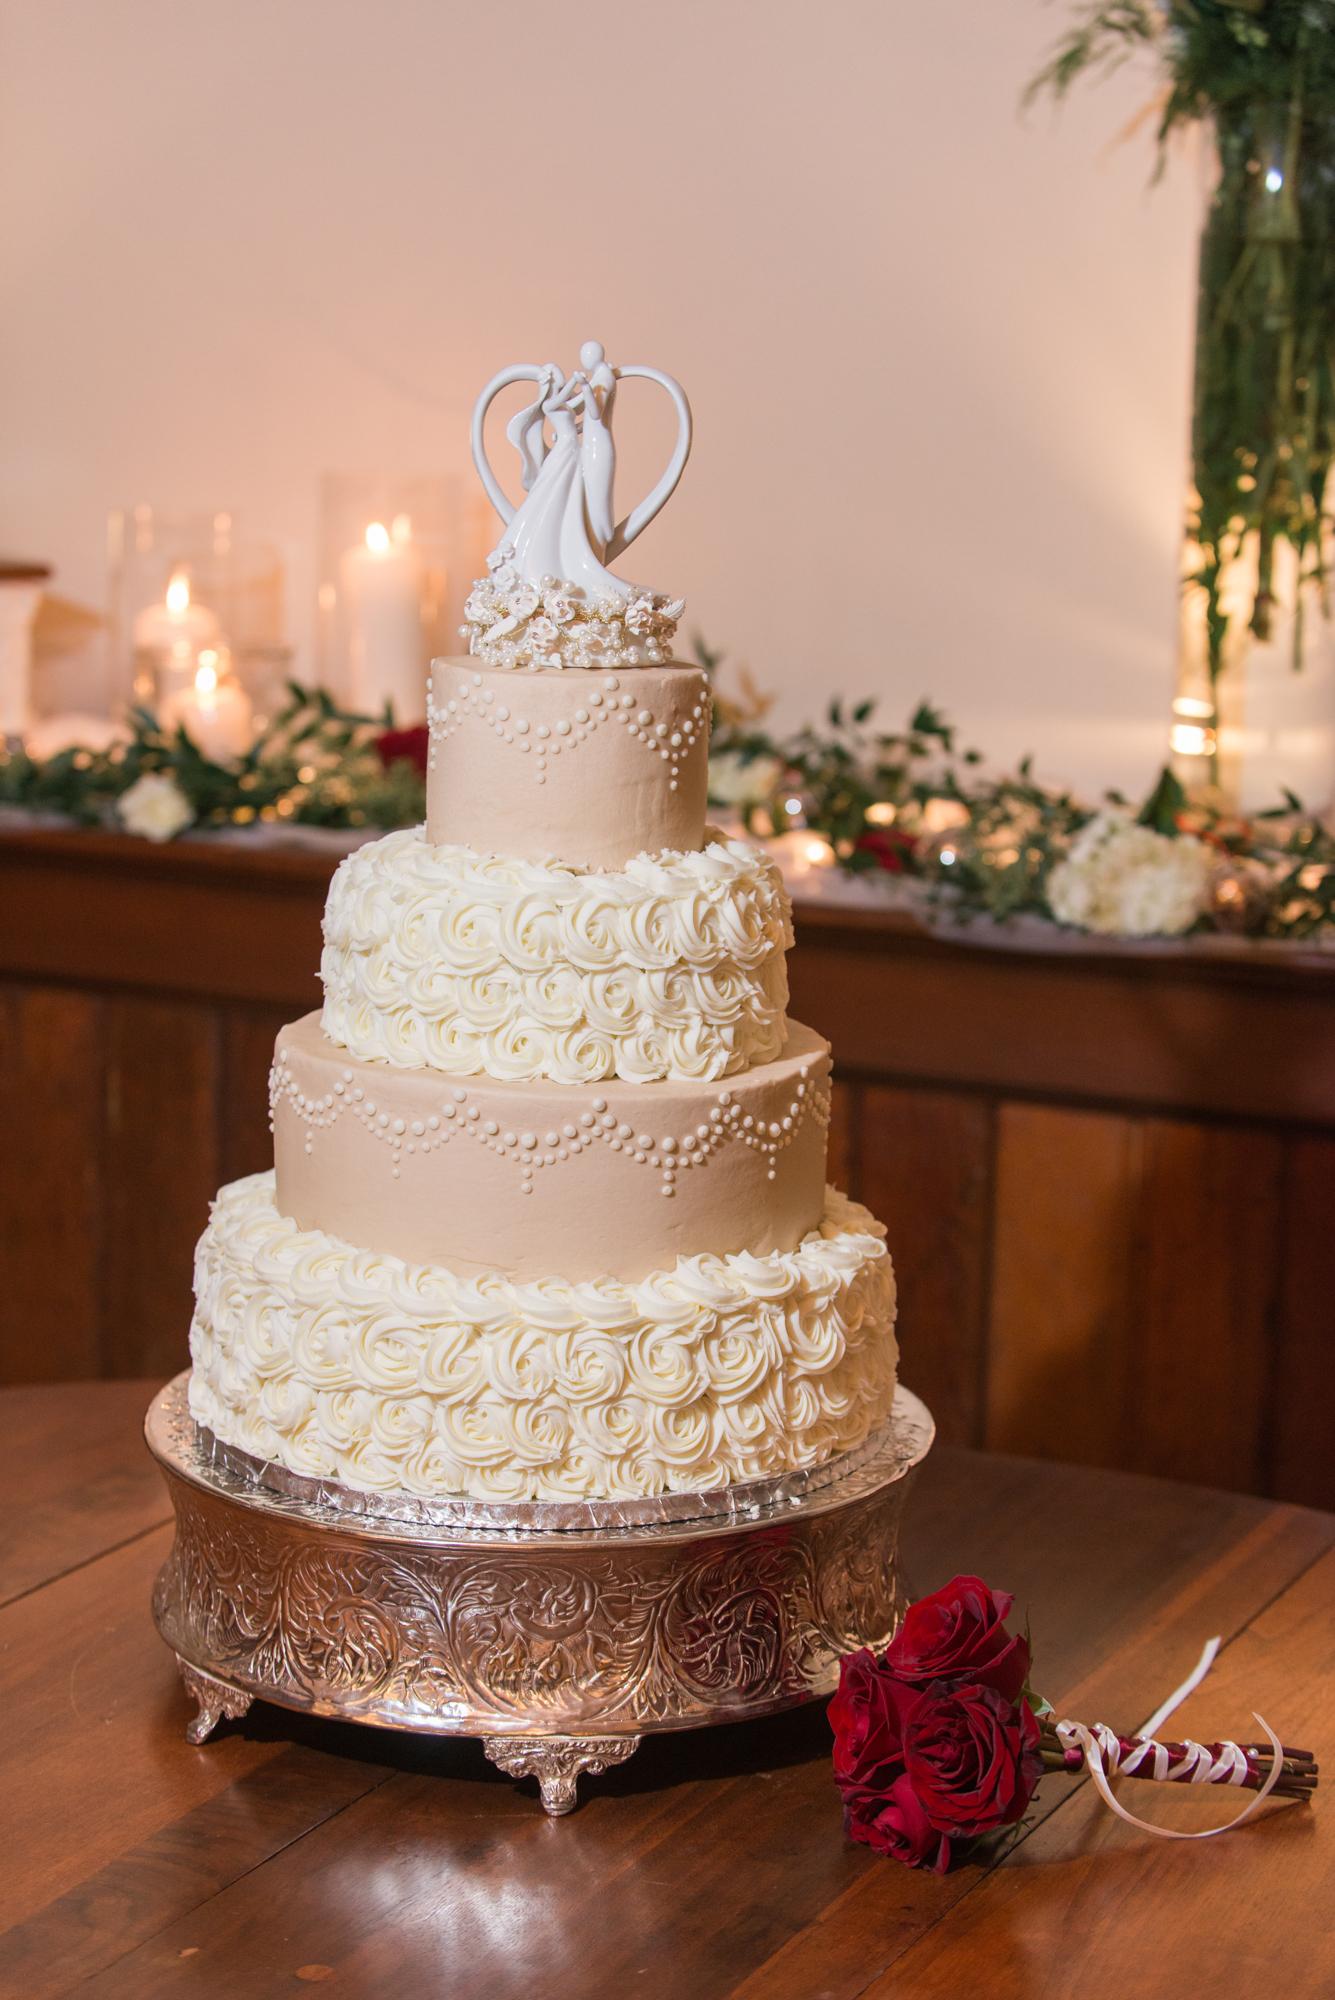 Yukti harman wedding cakes